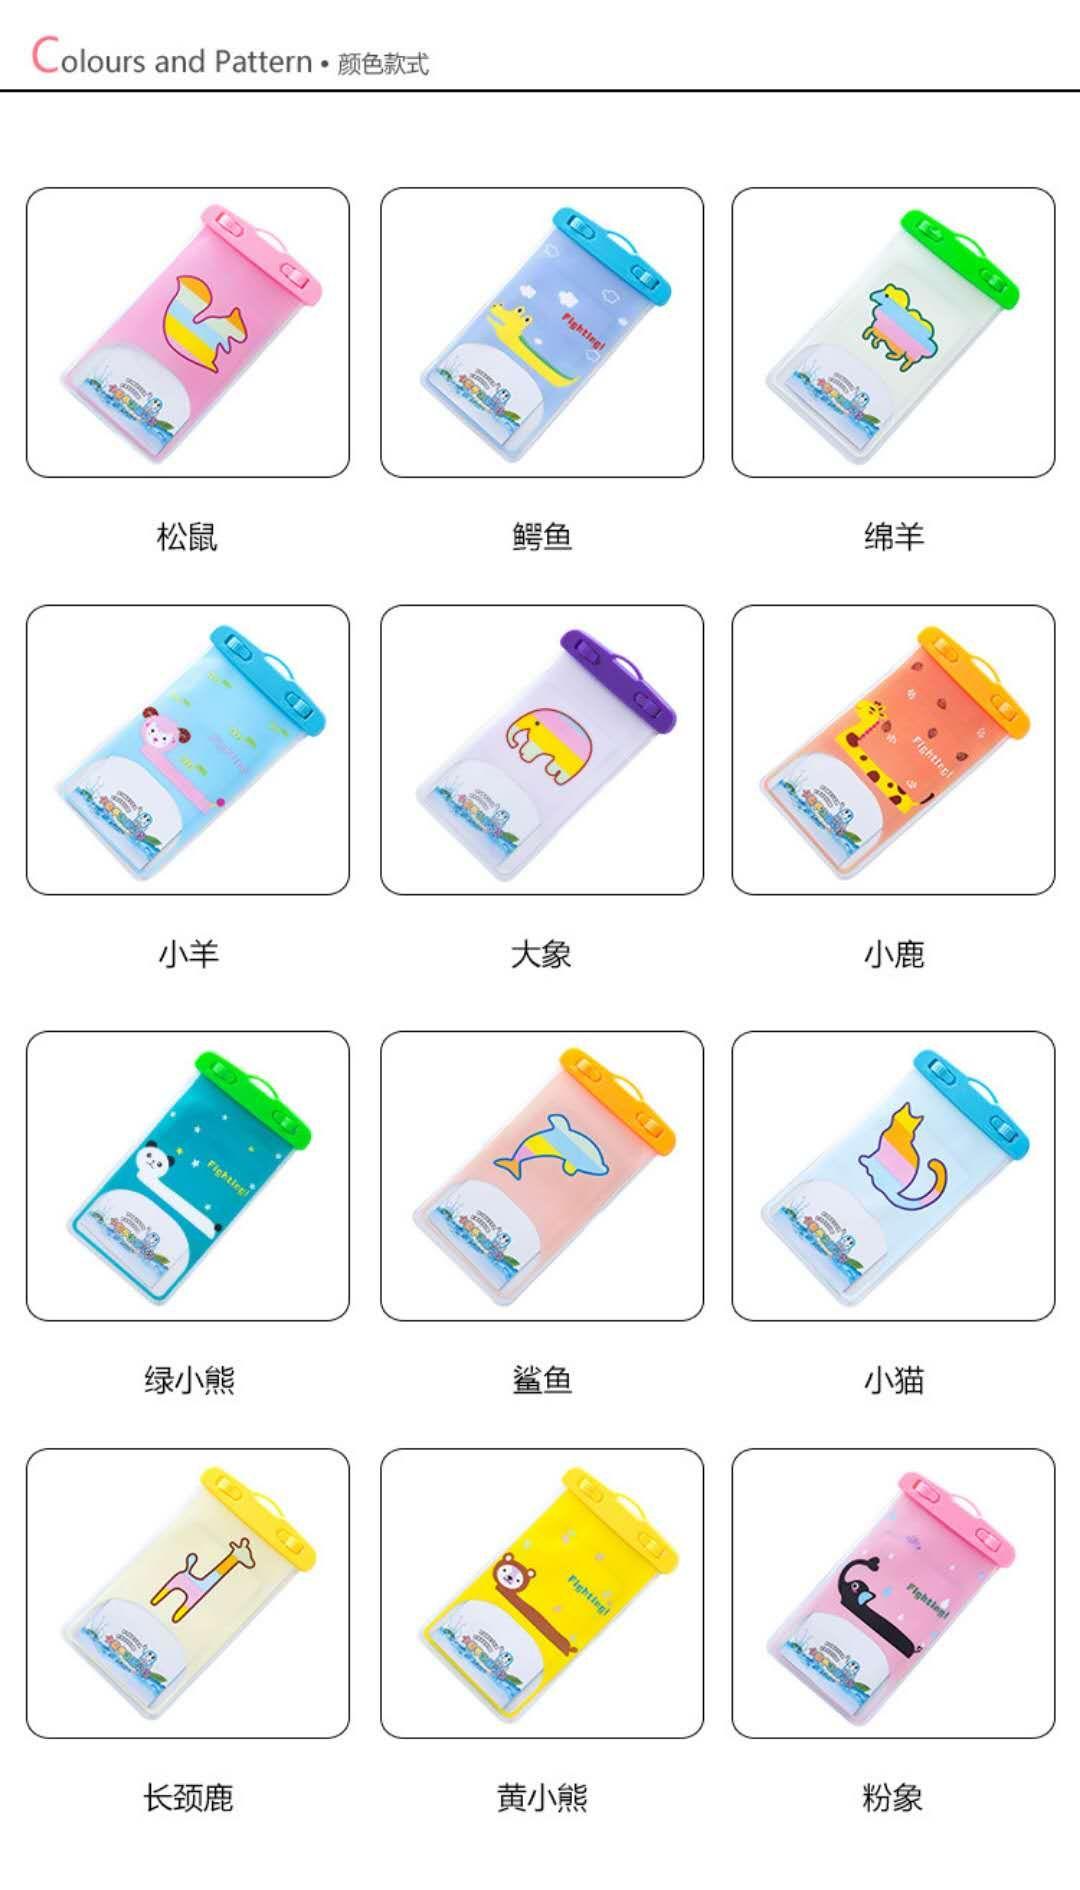 Funda impermeable universal Mpow, bolsa impermeable para teléfono IPX8 Bolsa seca